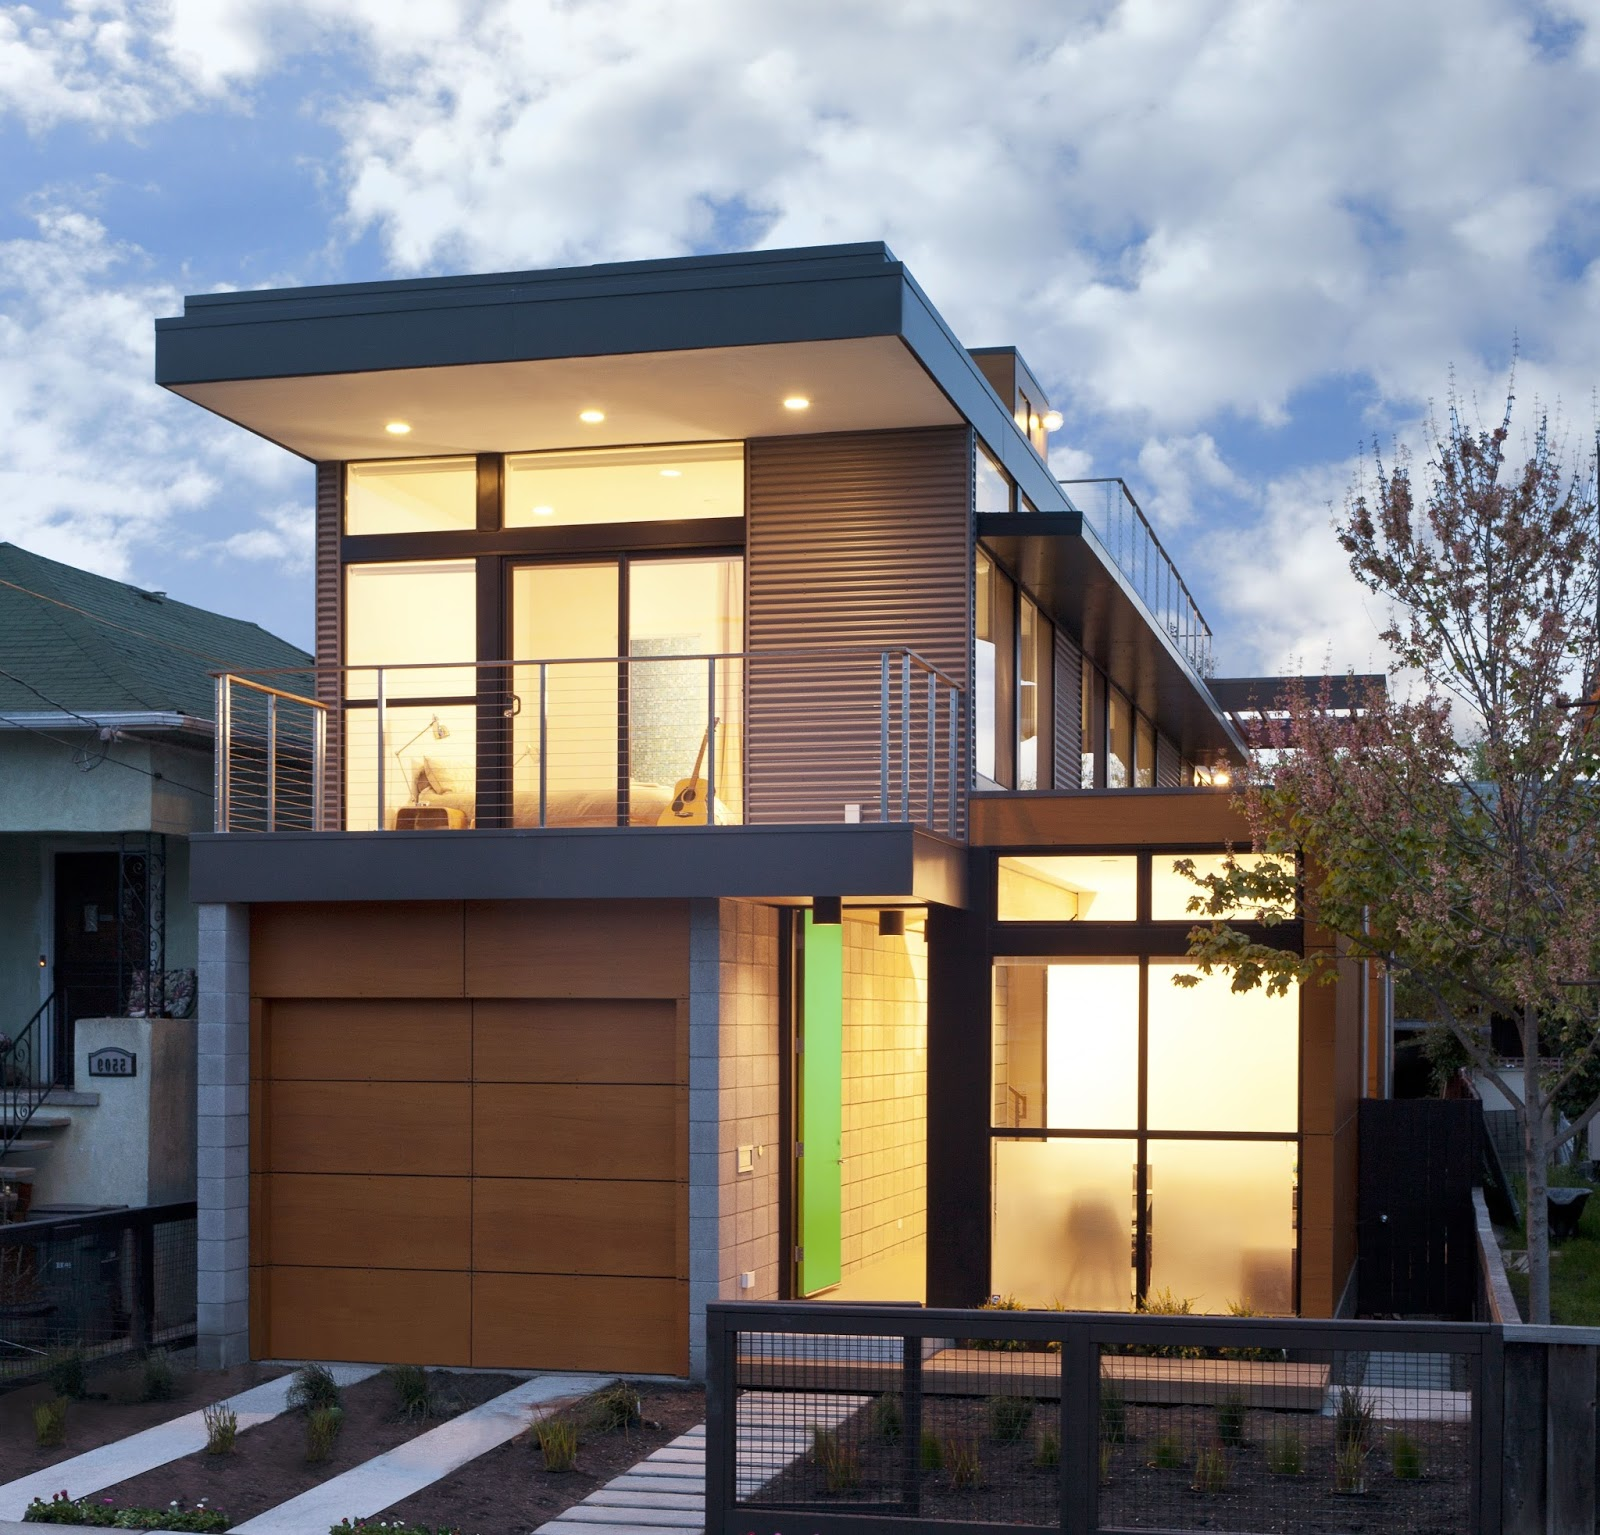 65 imagenes de fachadas de casas modernas minimalistas y On ver fachadas de casas modernas pequenas